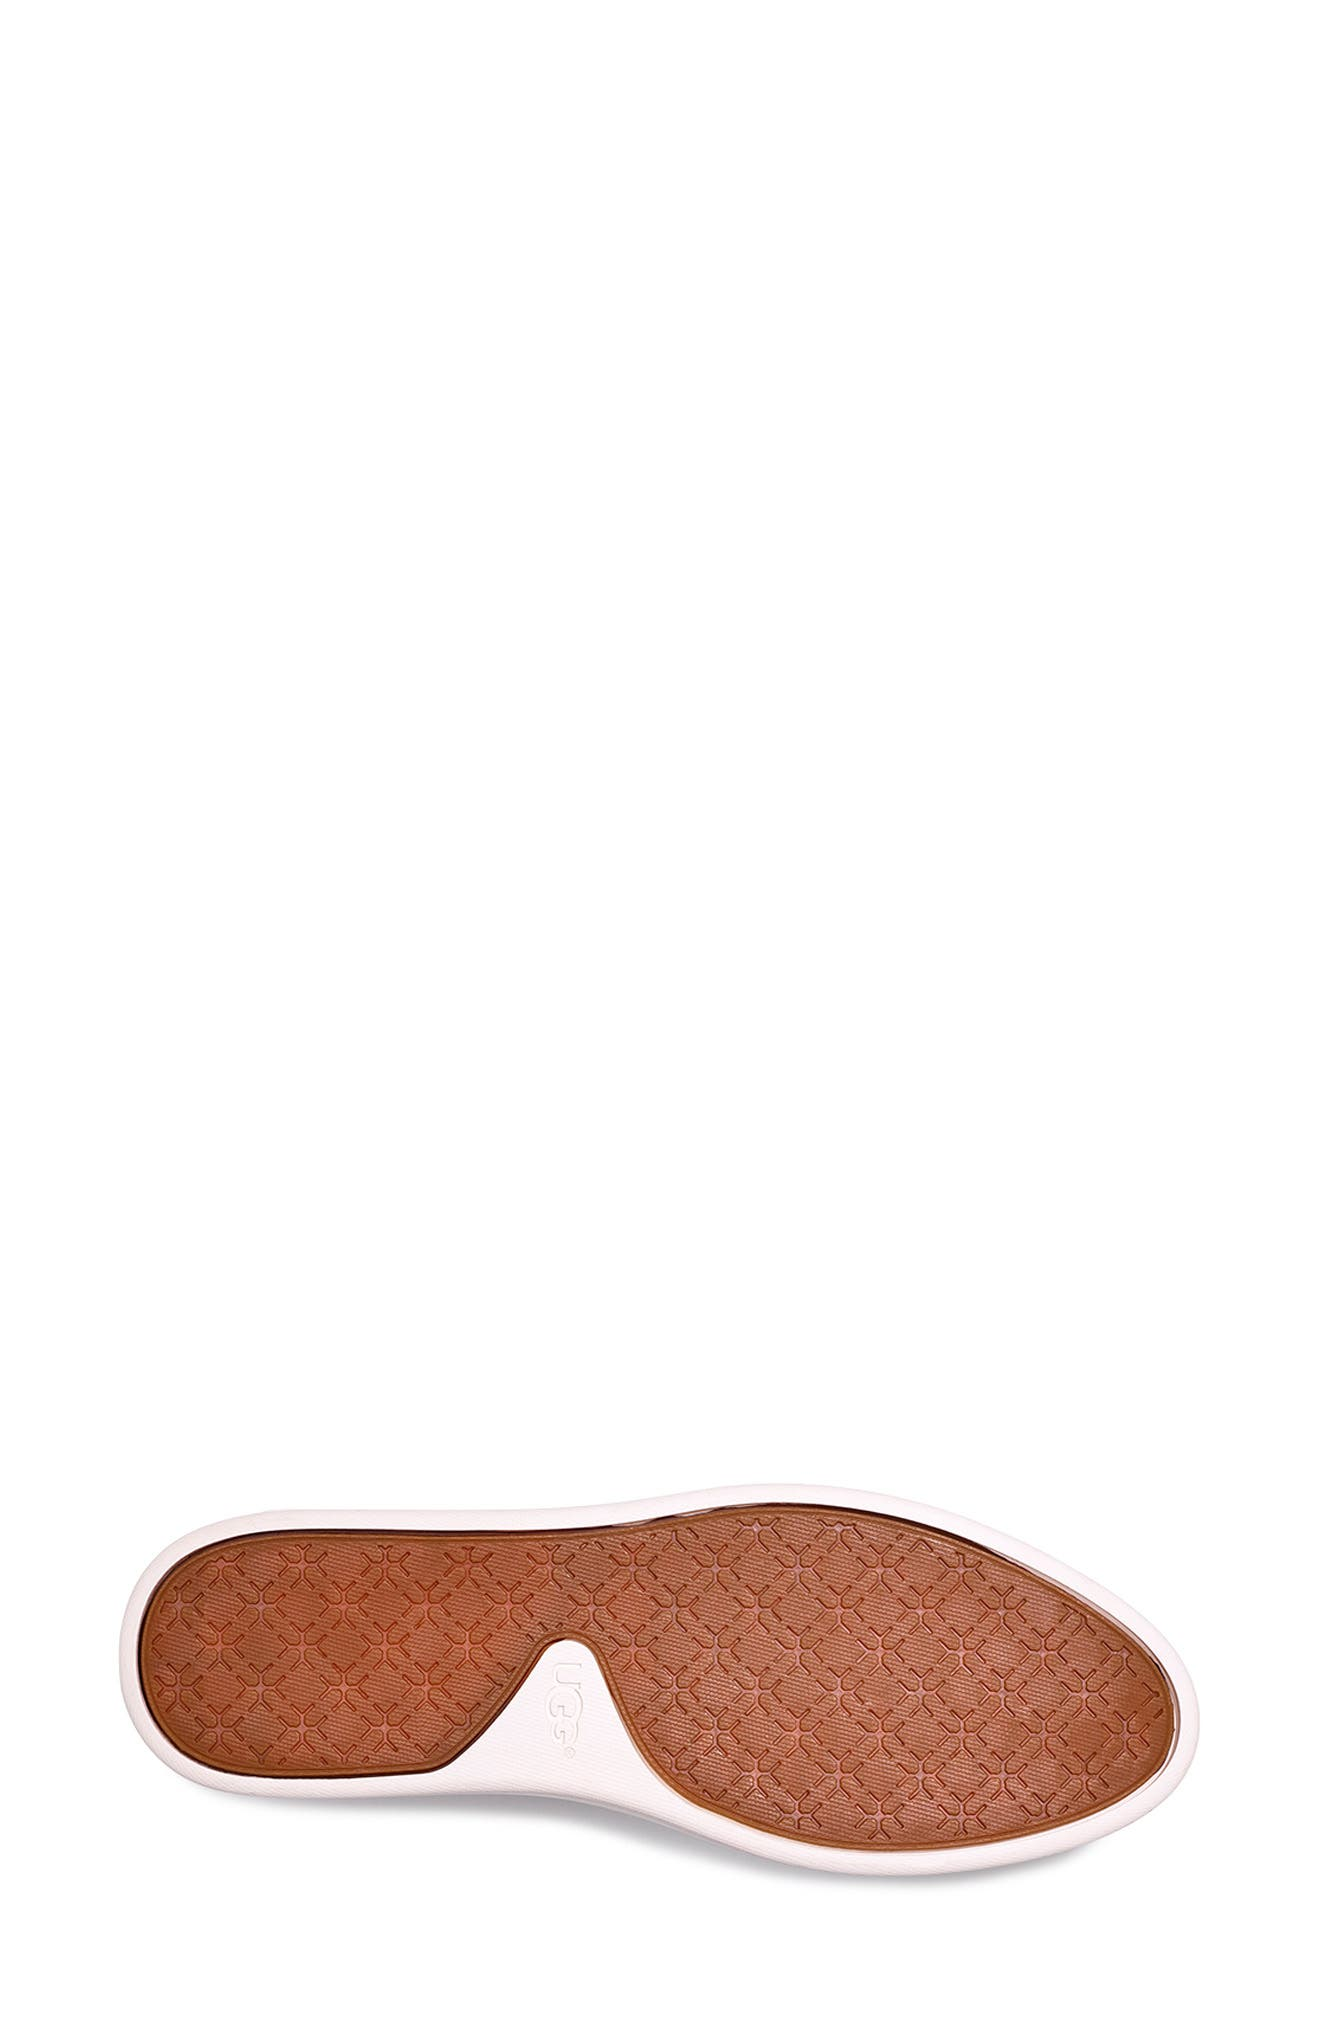 Sammy Sneaker,                             Alternate thumbnail 5, color,                             GREY VIOLET FABRIC